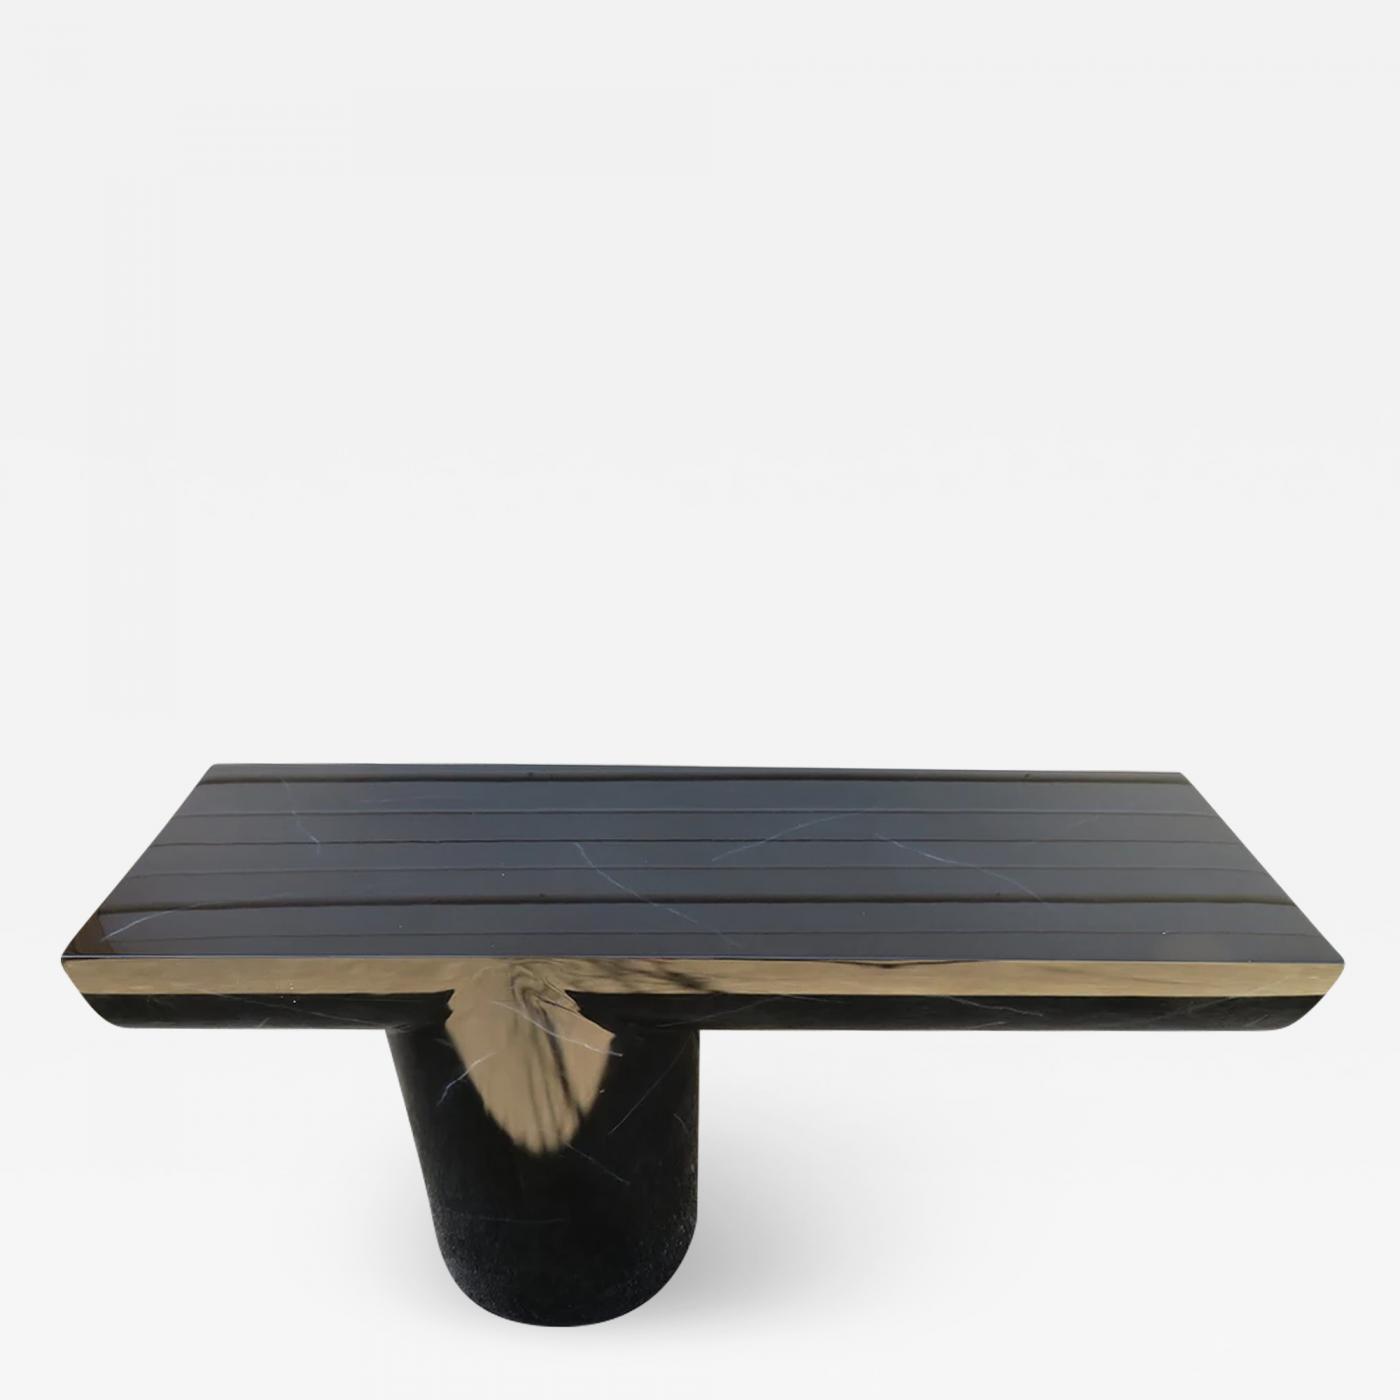 Terrific Brueton Brueton Mid Century Modern Cantilevered Lacquer Console Sofa Table Creativecarmelina Interior Chair Design Creativecarmelinacom